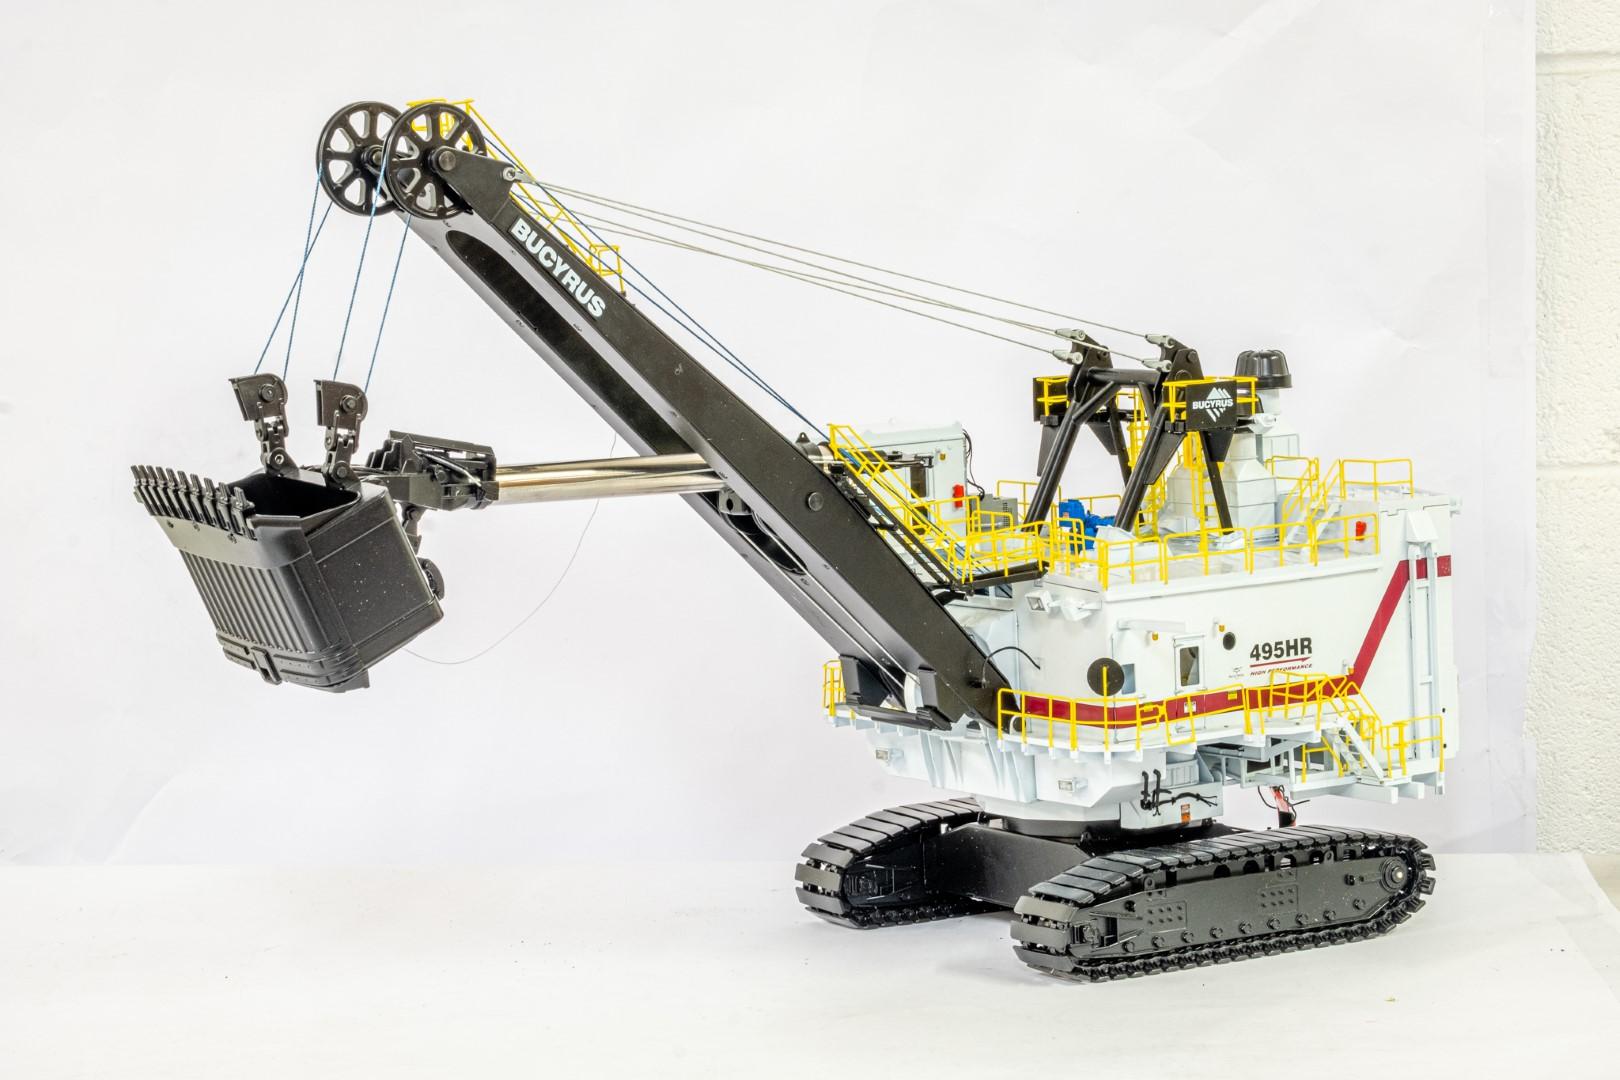 TWH Bucyrus 495HR Electric Mining Shovel -